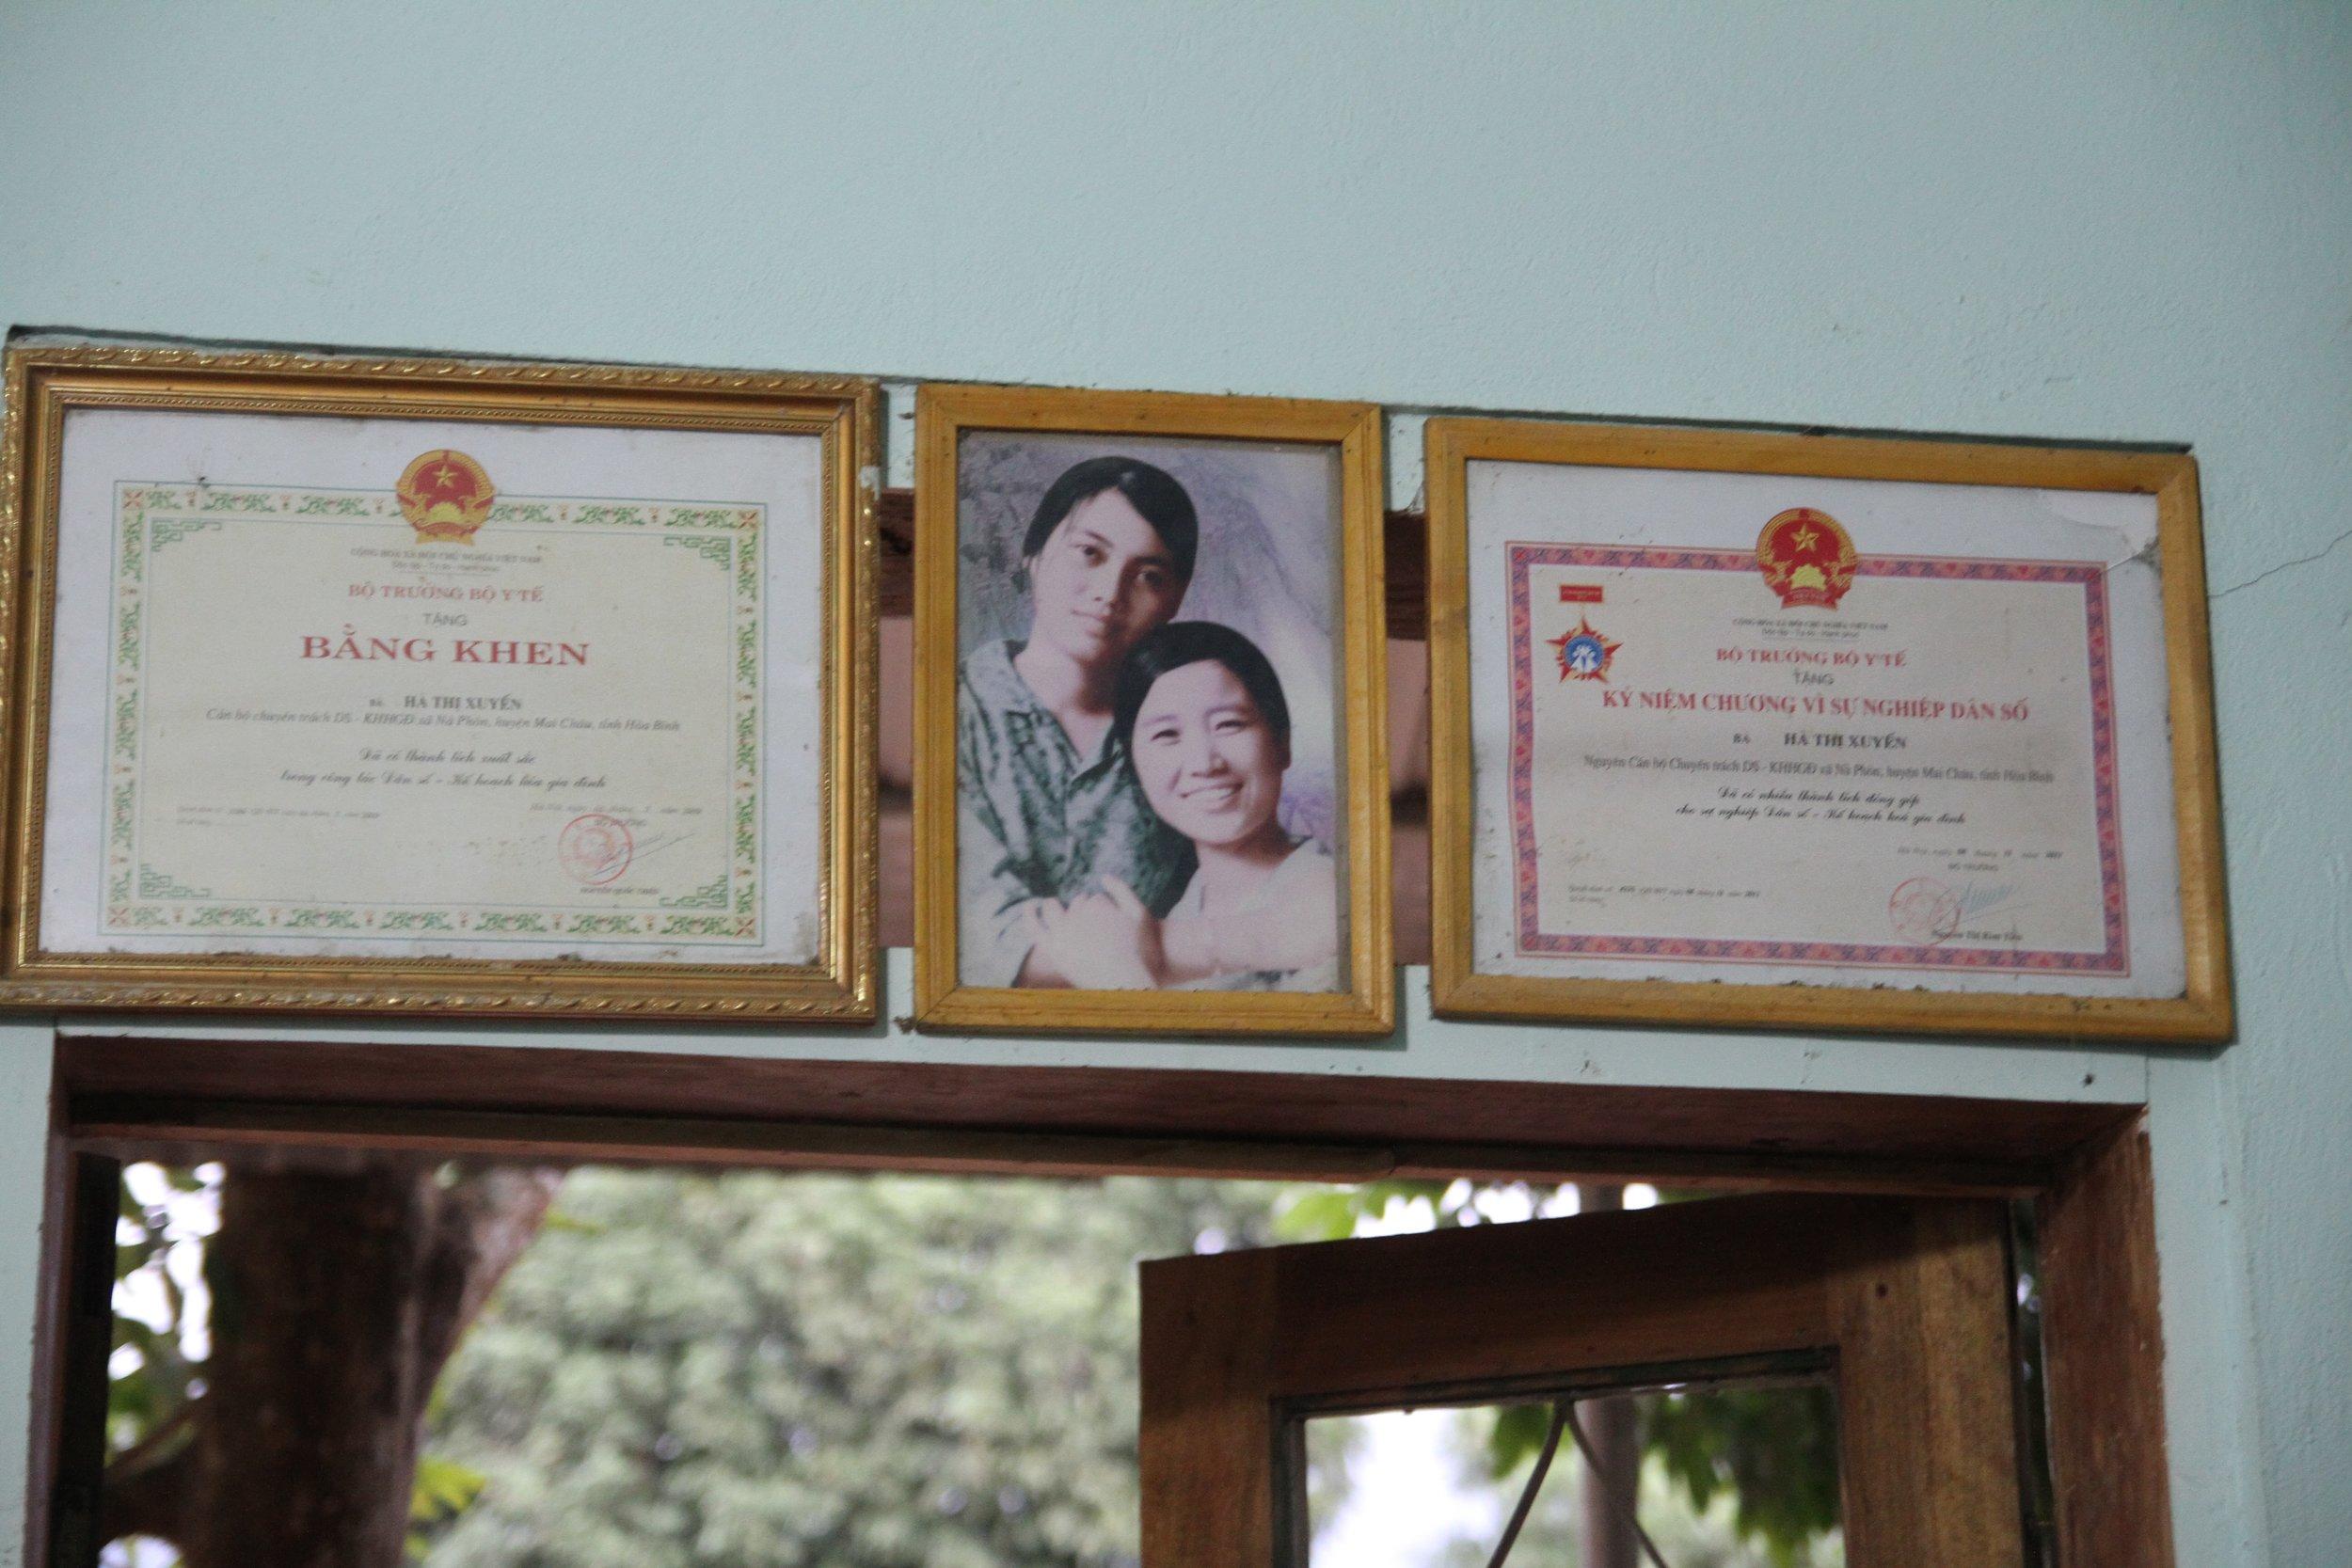 Certificates hang inside a home